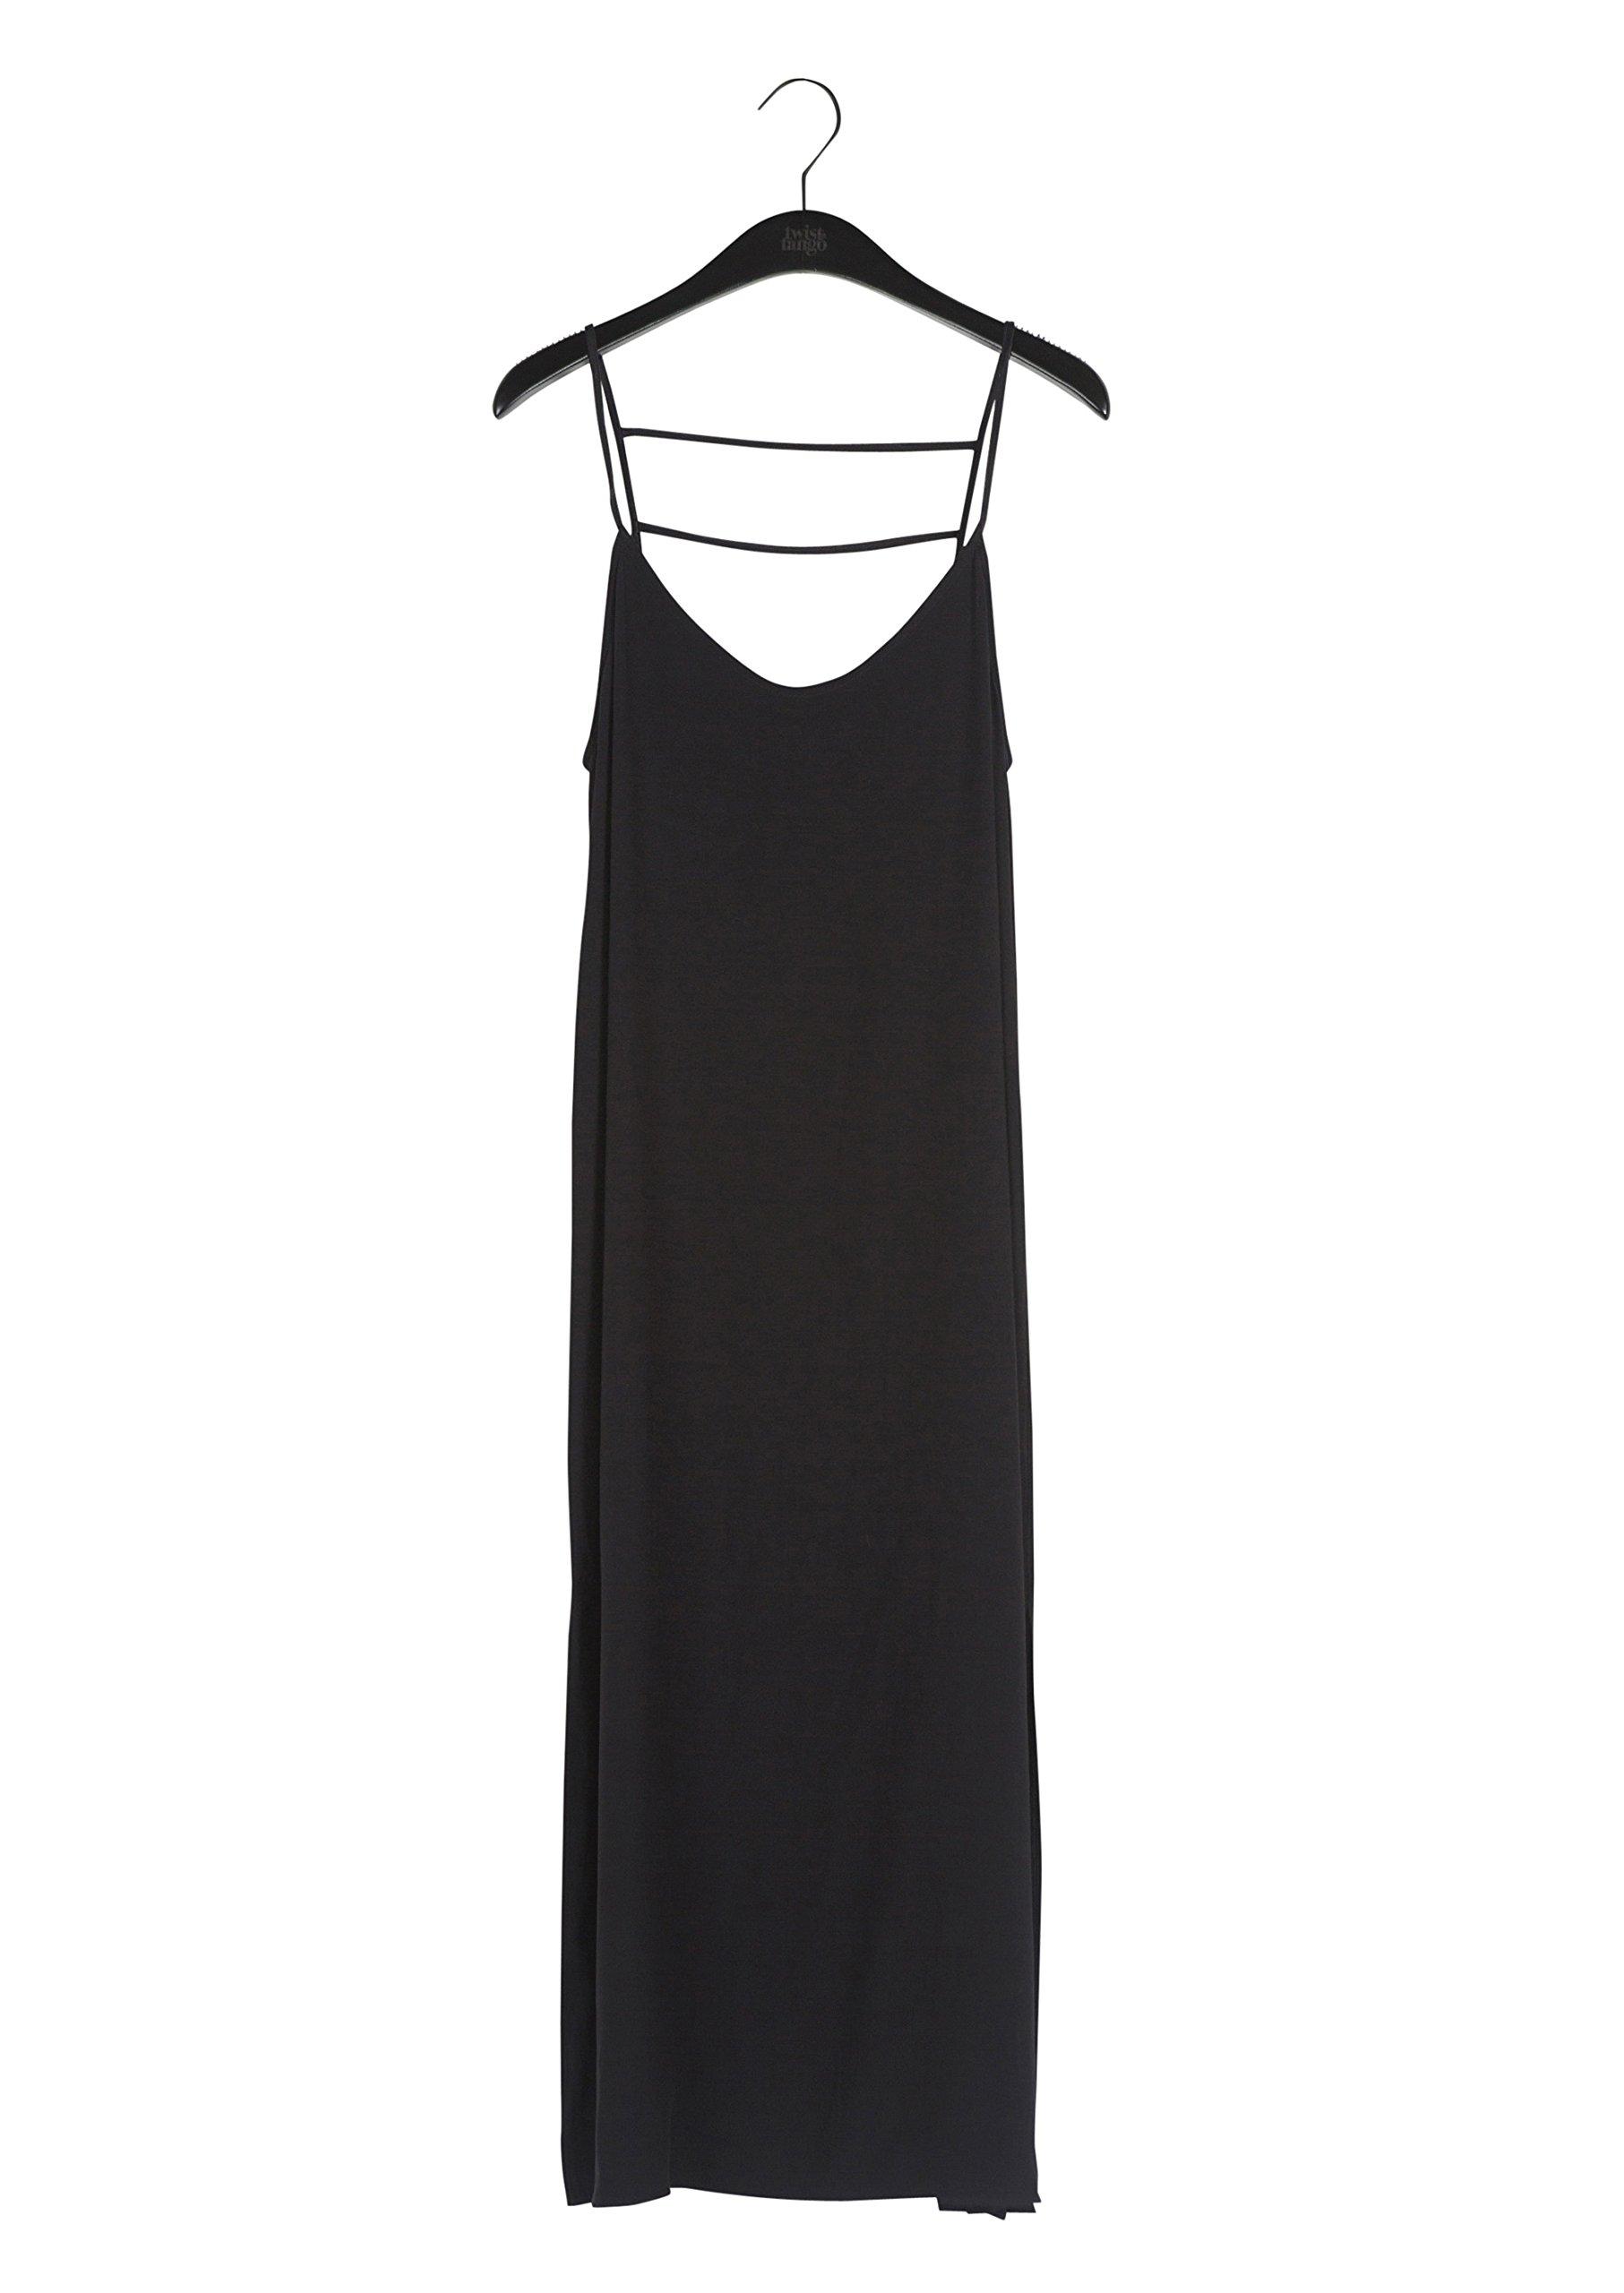 Dress Fabricant Tango 68Femme 0642taille Twistamp; Gwyneth RobeNoirblack lcJFTK1